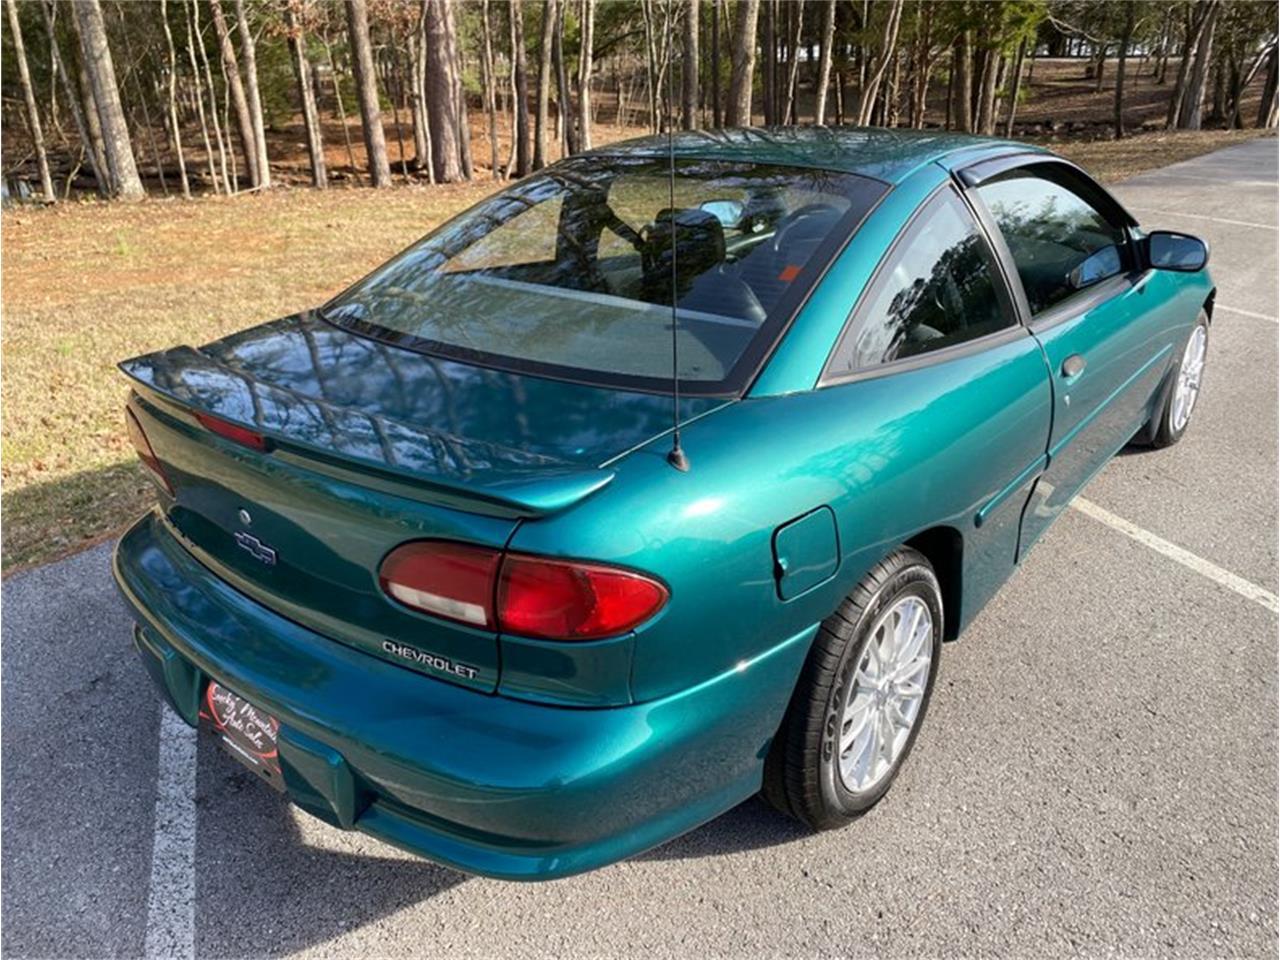 1997 Chevrolet Cavalier (CC-1352947) for sale in Lenoir City, Tennessee